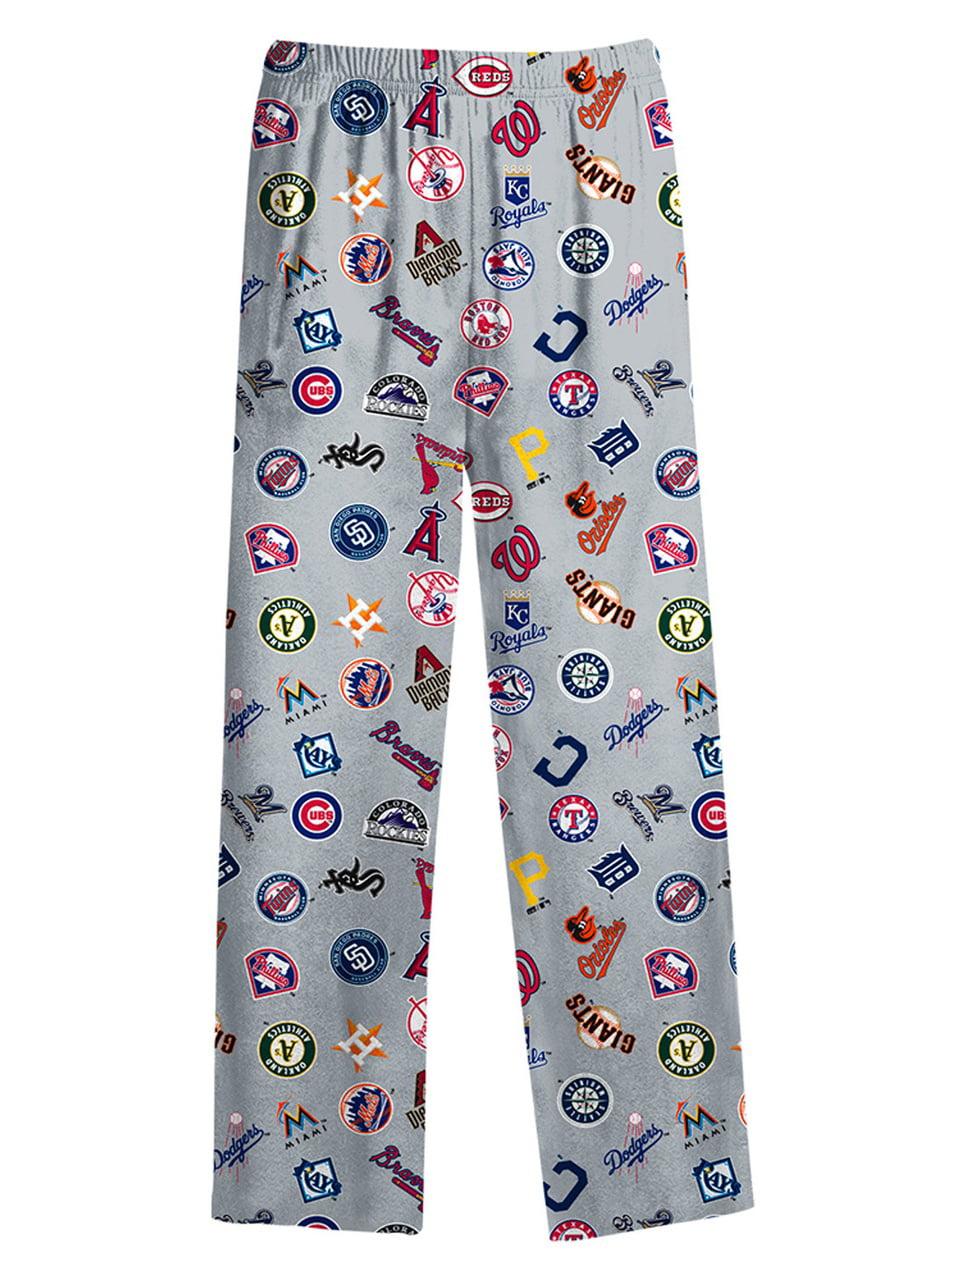 Major League Baseball Kid's All Over Printed Pants Gray by Genuine Stuff